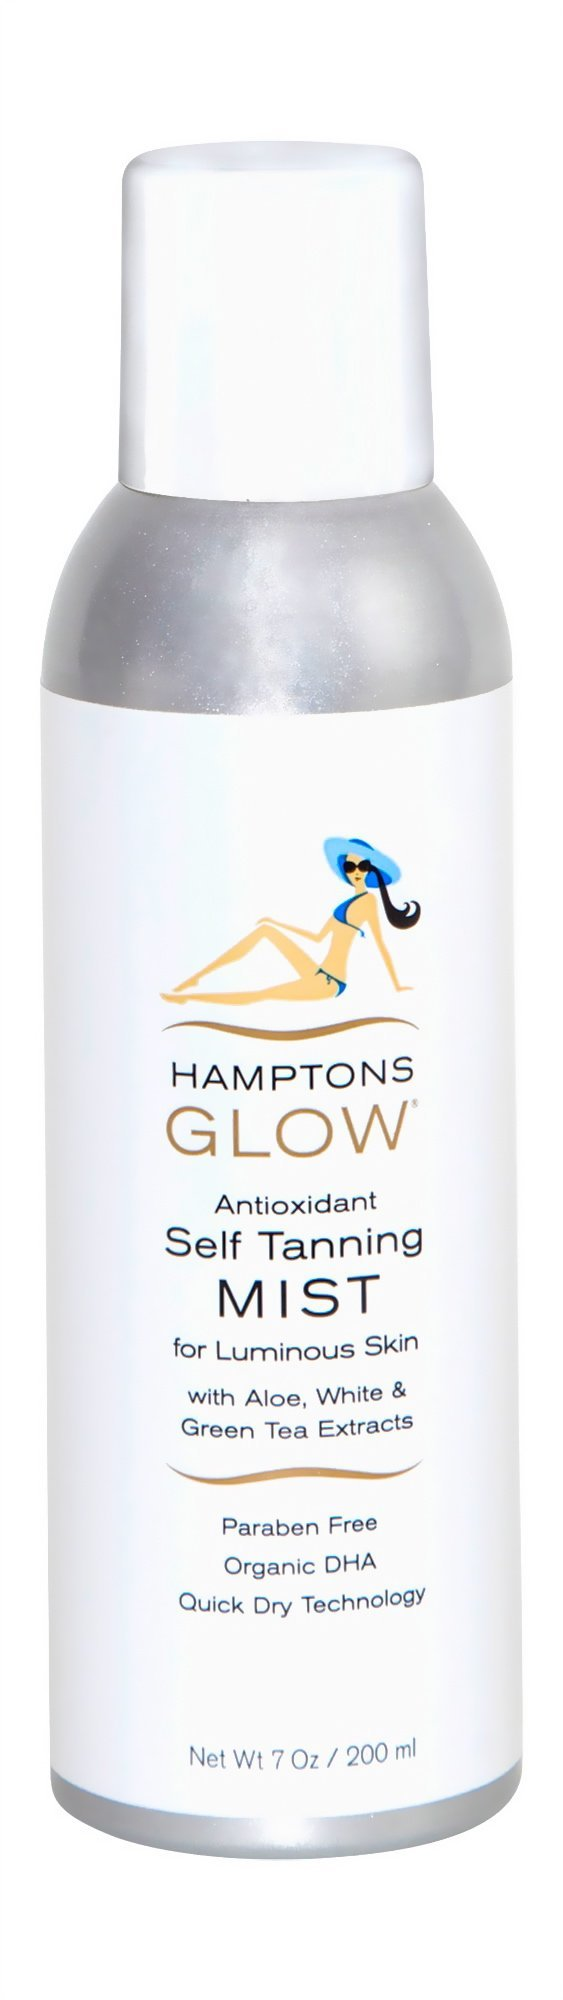 Hamptons Glow Self Tanning Mist Antioxidant Organic Luminous Not-Orange (Same Coverage as 3 Salon Visits) Includes Professional Instructions, 7 fl. oz. / 207ml